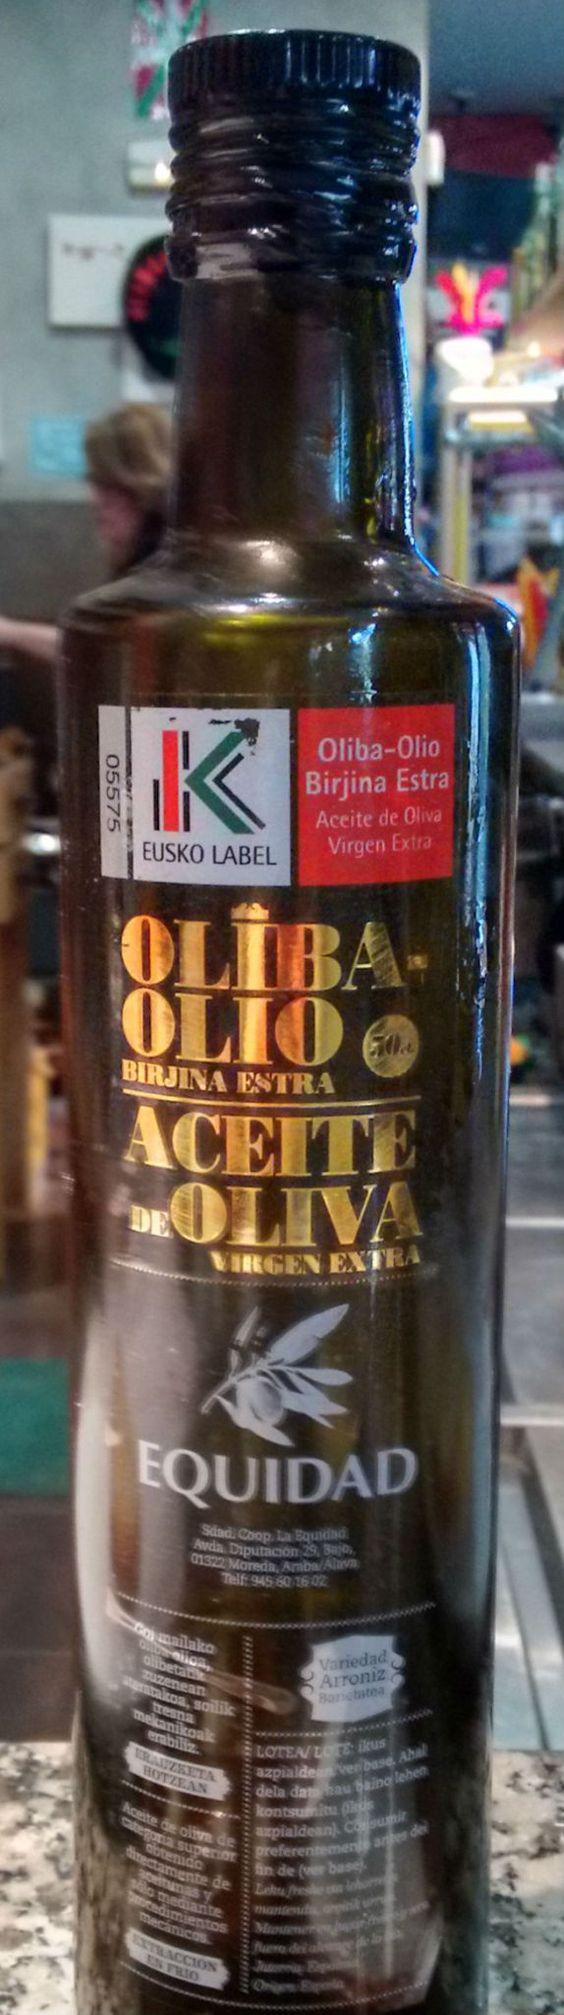 Botella de aceite Equidad AOVE de Rioja Alavesa con Eusko-Lavel.